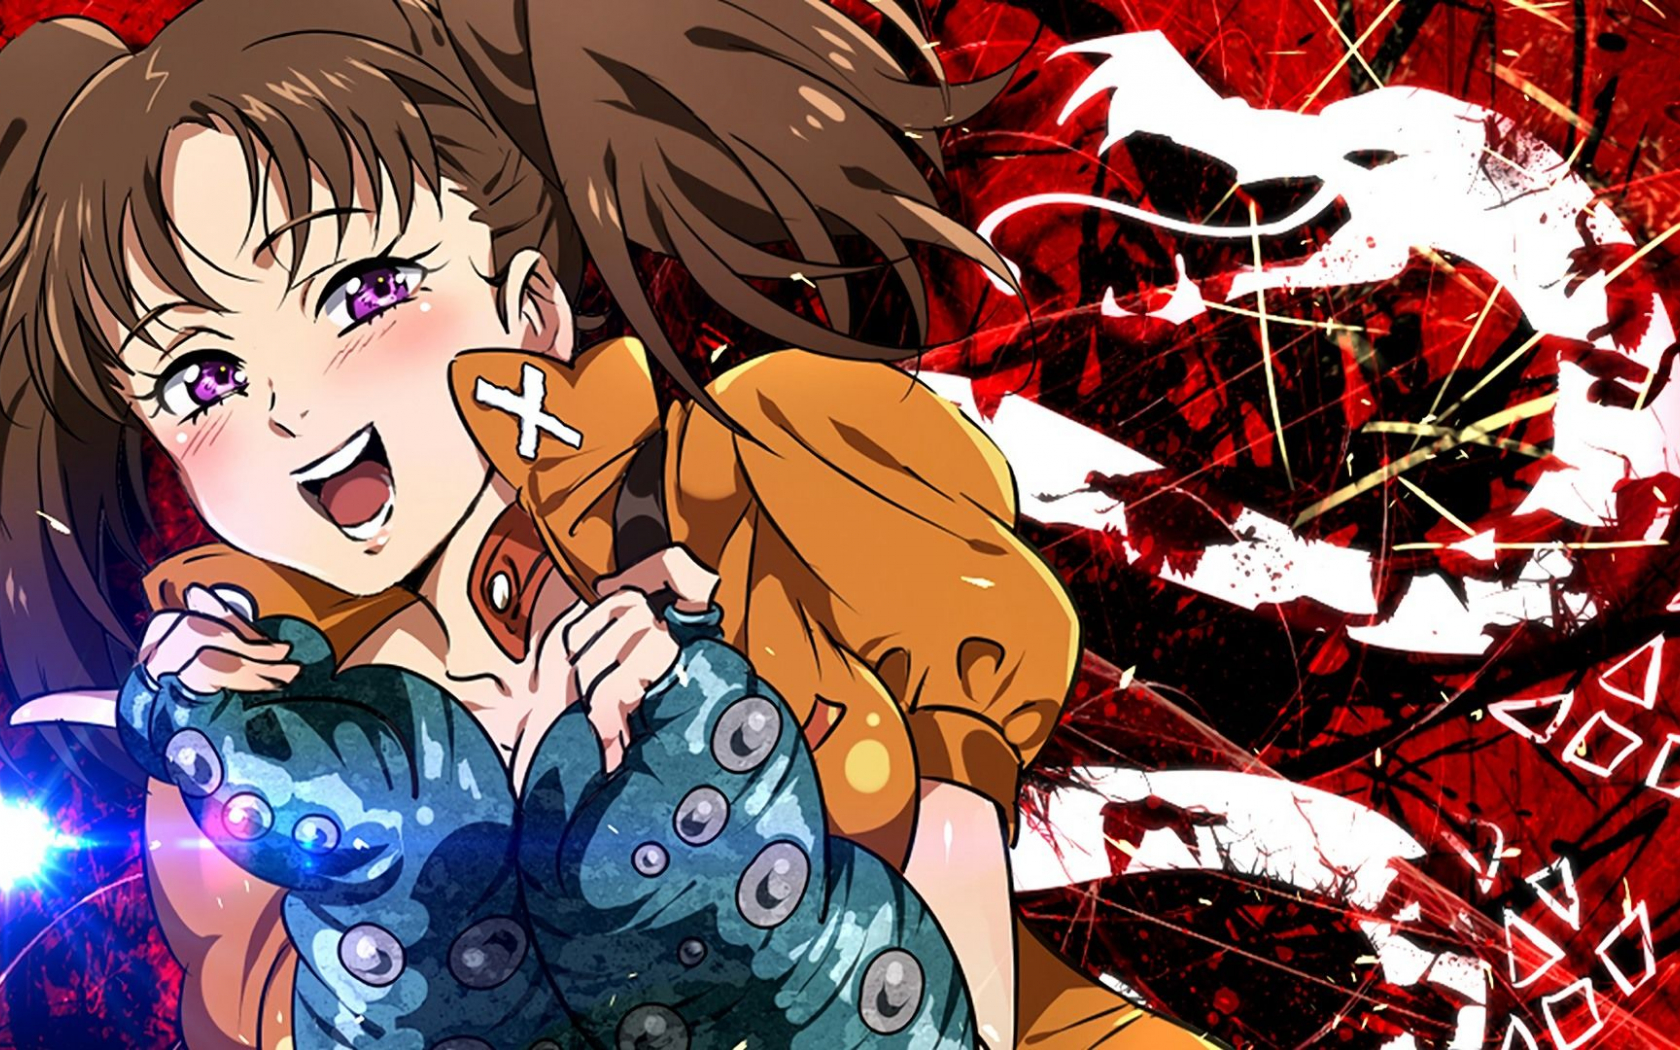 Free Download Diane Seven Deadly Sins Anime Girl Wallpaper 2367